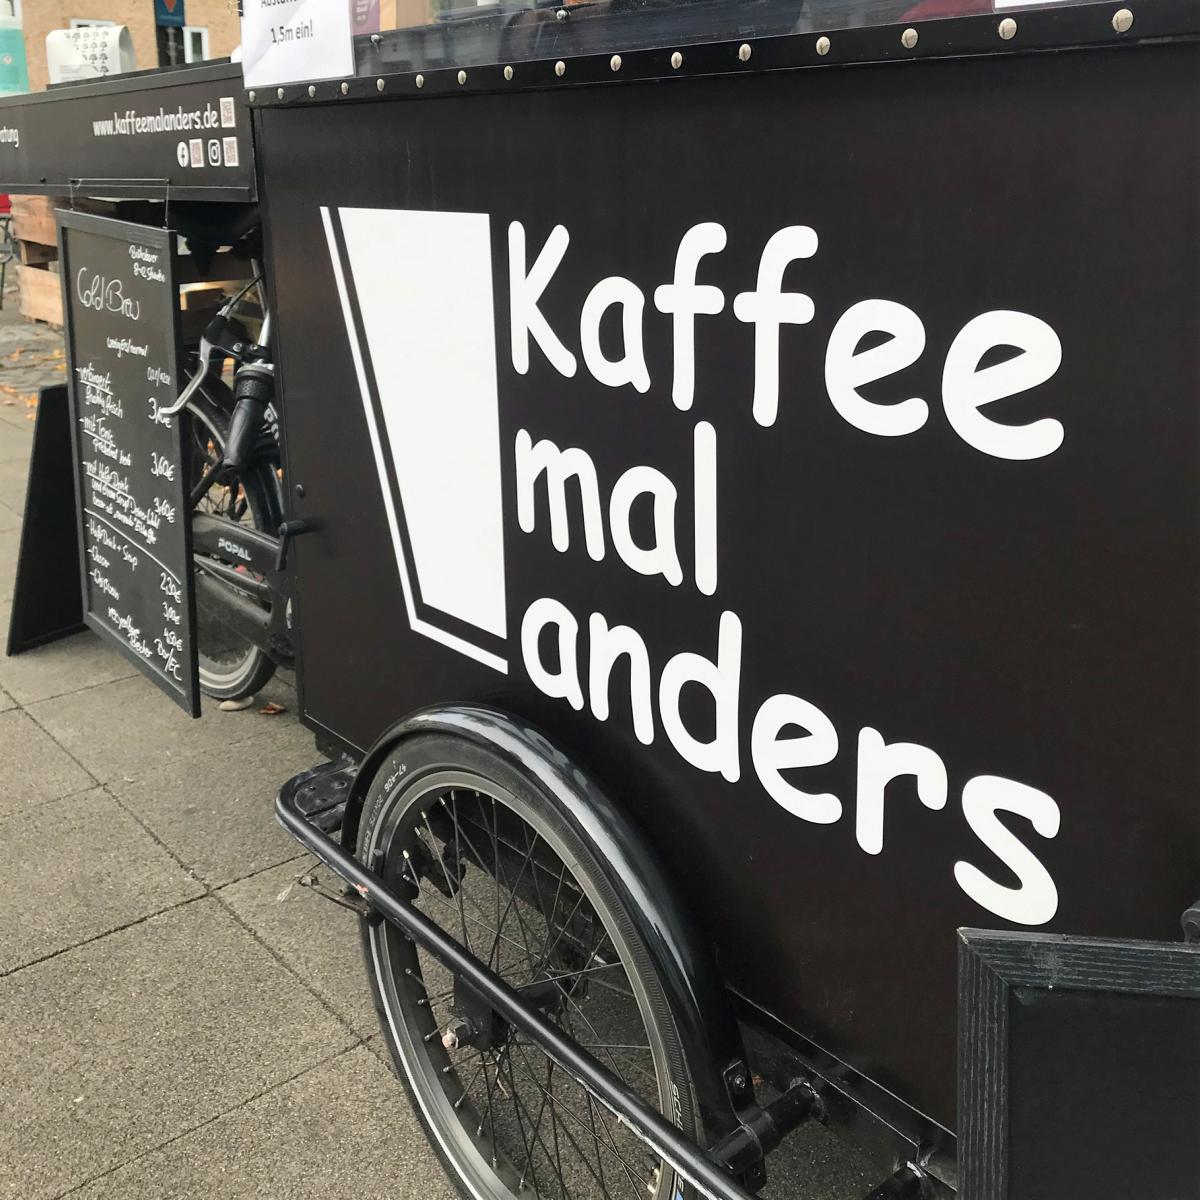 Style Hannover Kaffee mal anders 1 - Kaffee mal anders - kalt statt warm